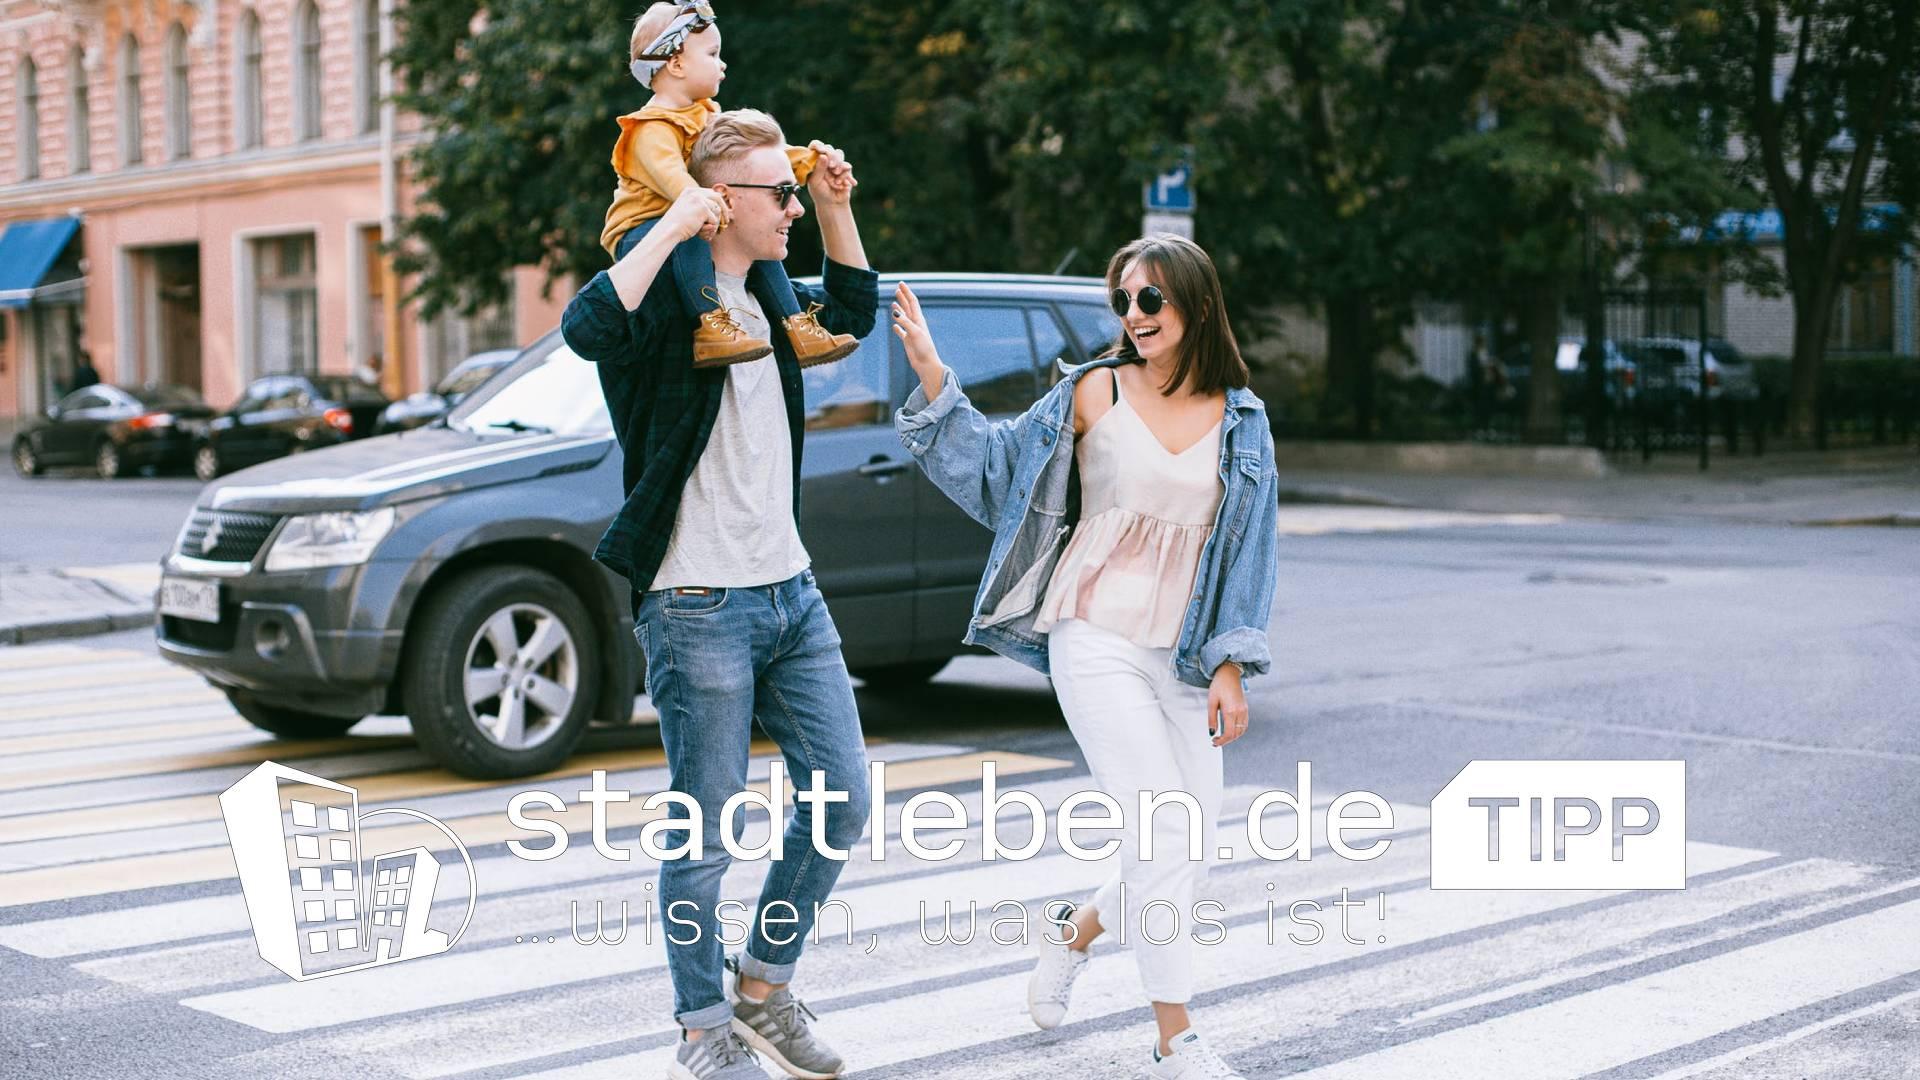 Familienausflug, Mama, Papa, Kind Freizeit, Familie, Entdecken, Stadt, Auto